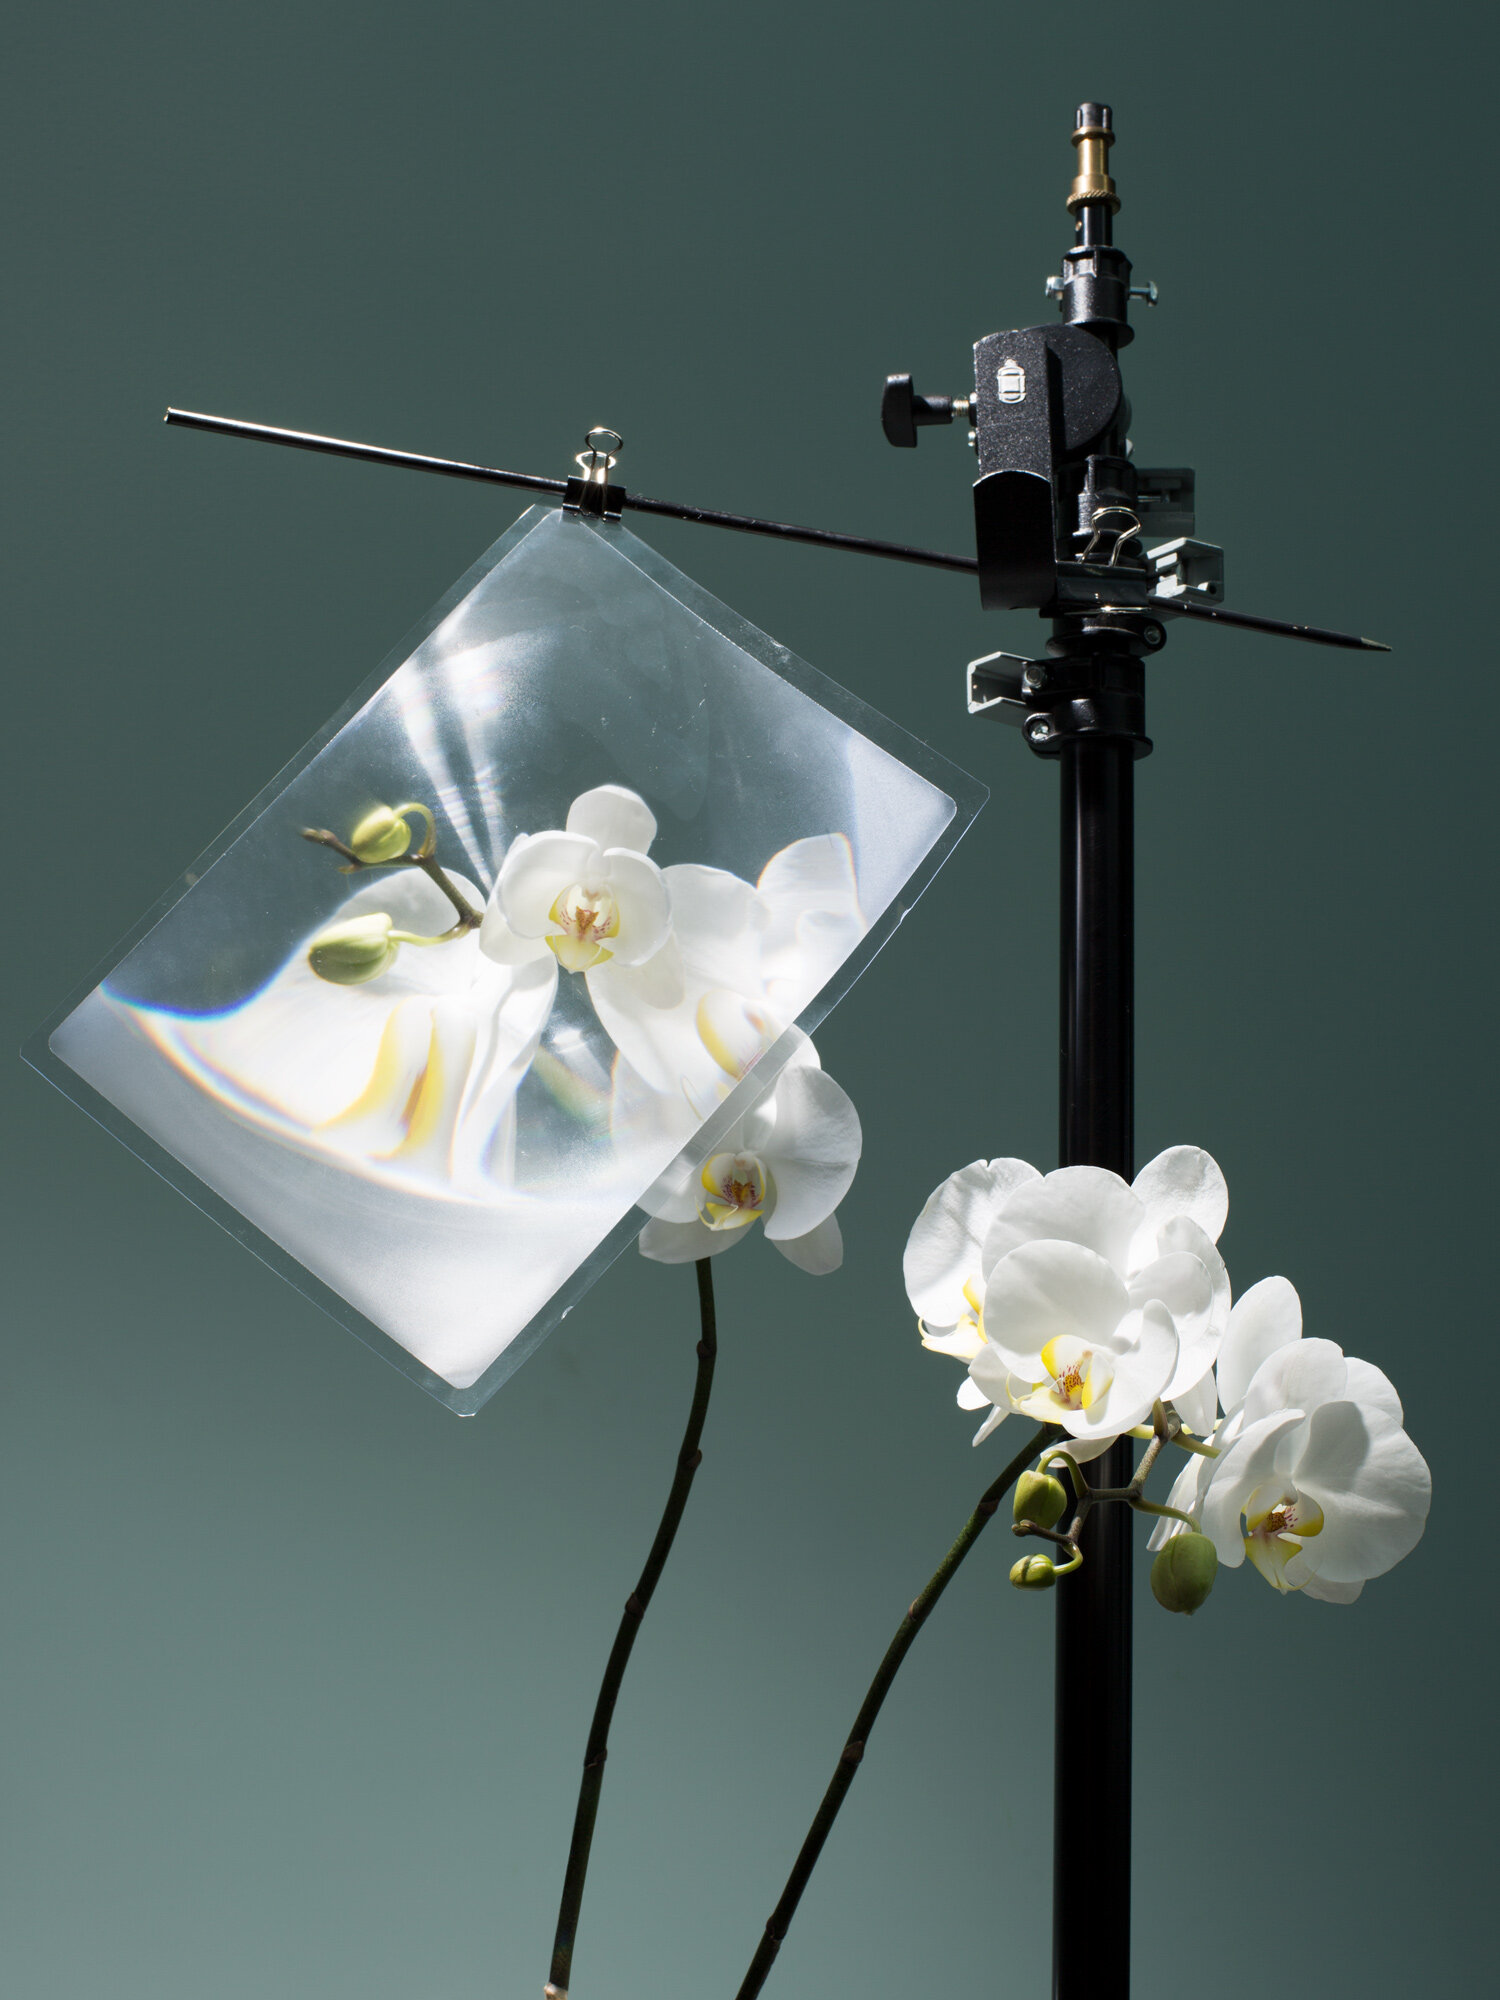 Orchid_Lens_web.jpg